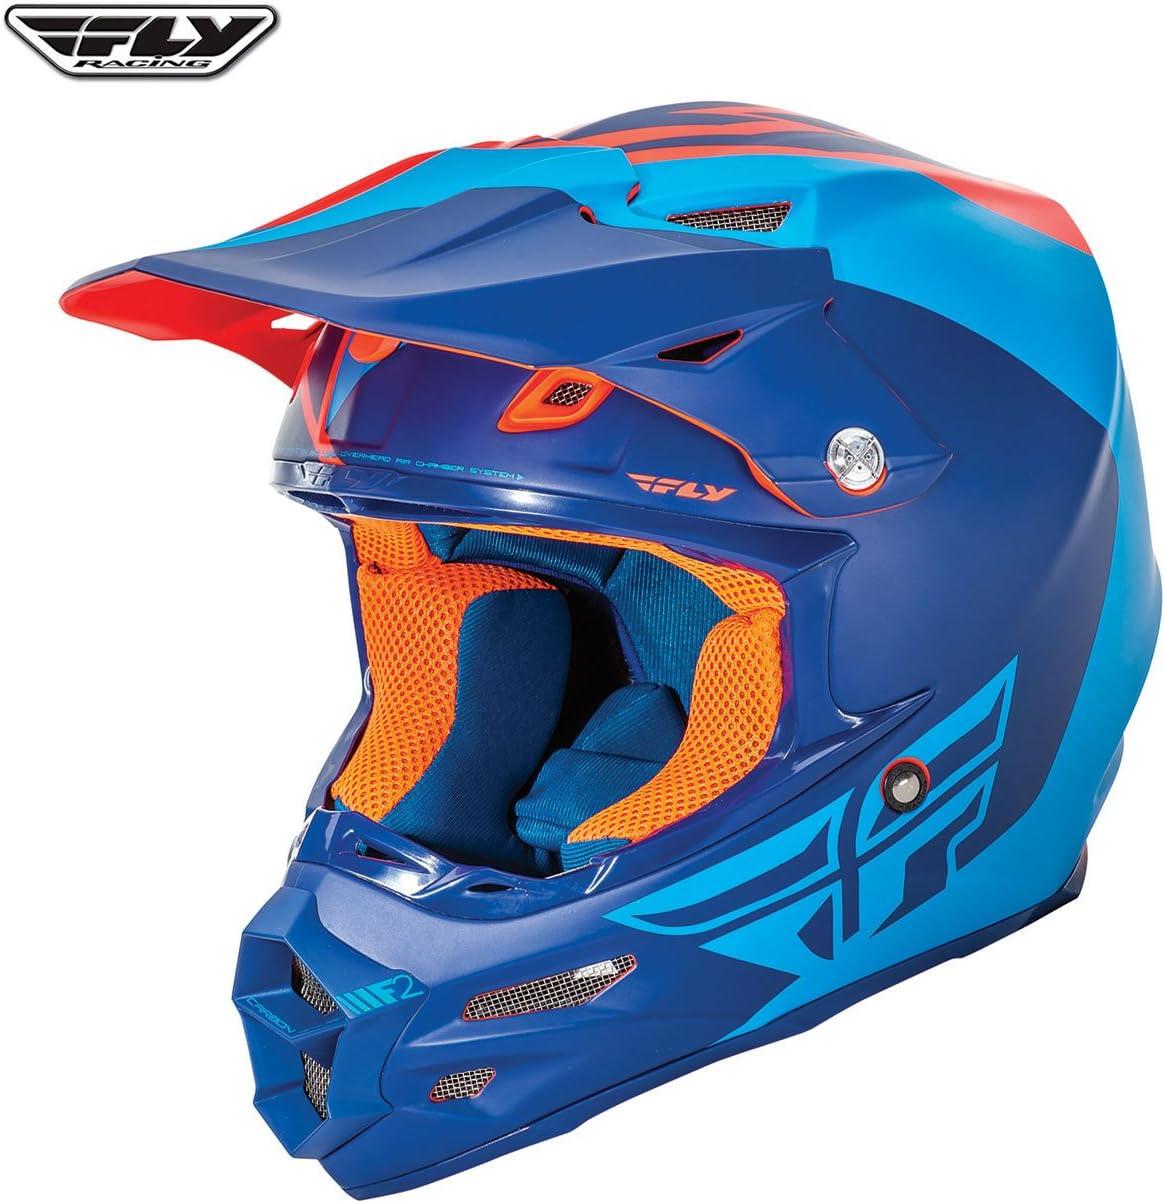 Fly 372-01808 Racing 2019 Lite Rockstar Motocross Gloves S 8 Yellow Black